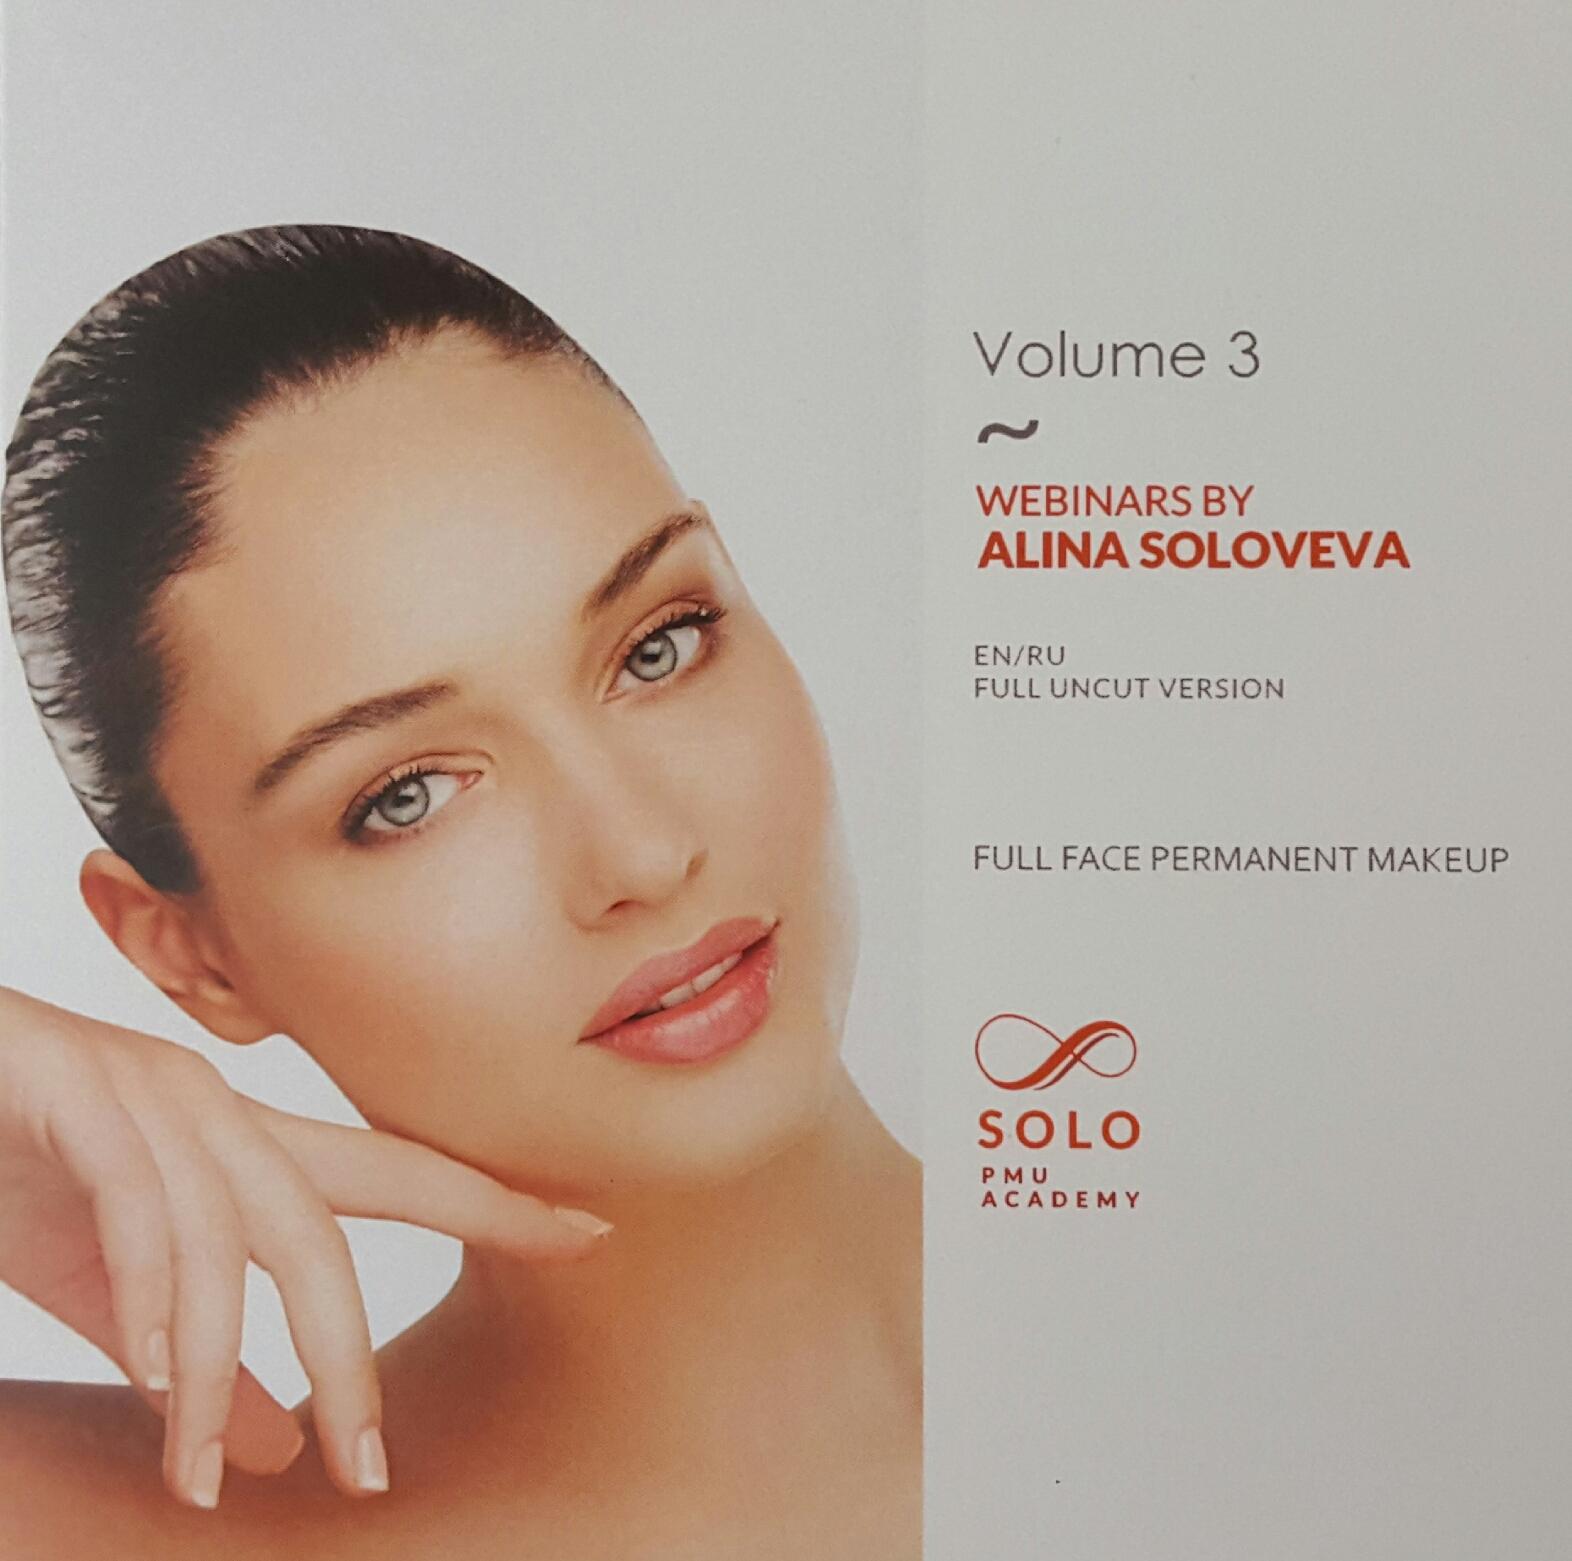 WEBINARS by Alina Soloveva vol.3 DVD